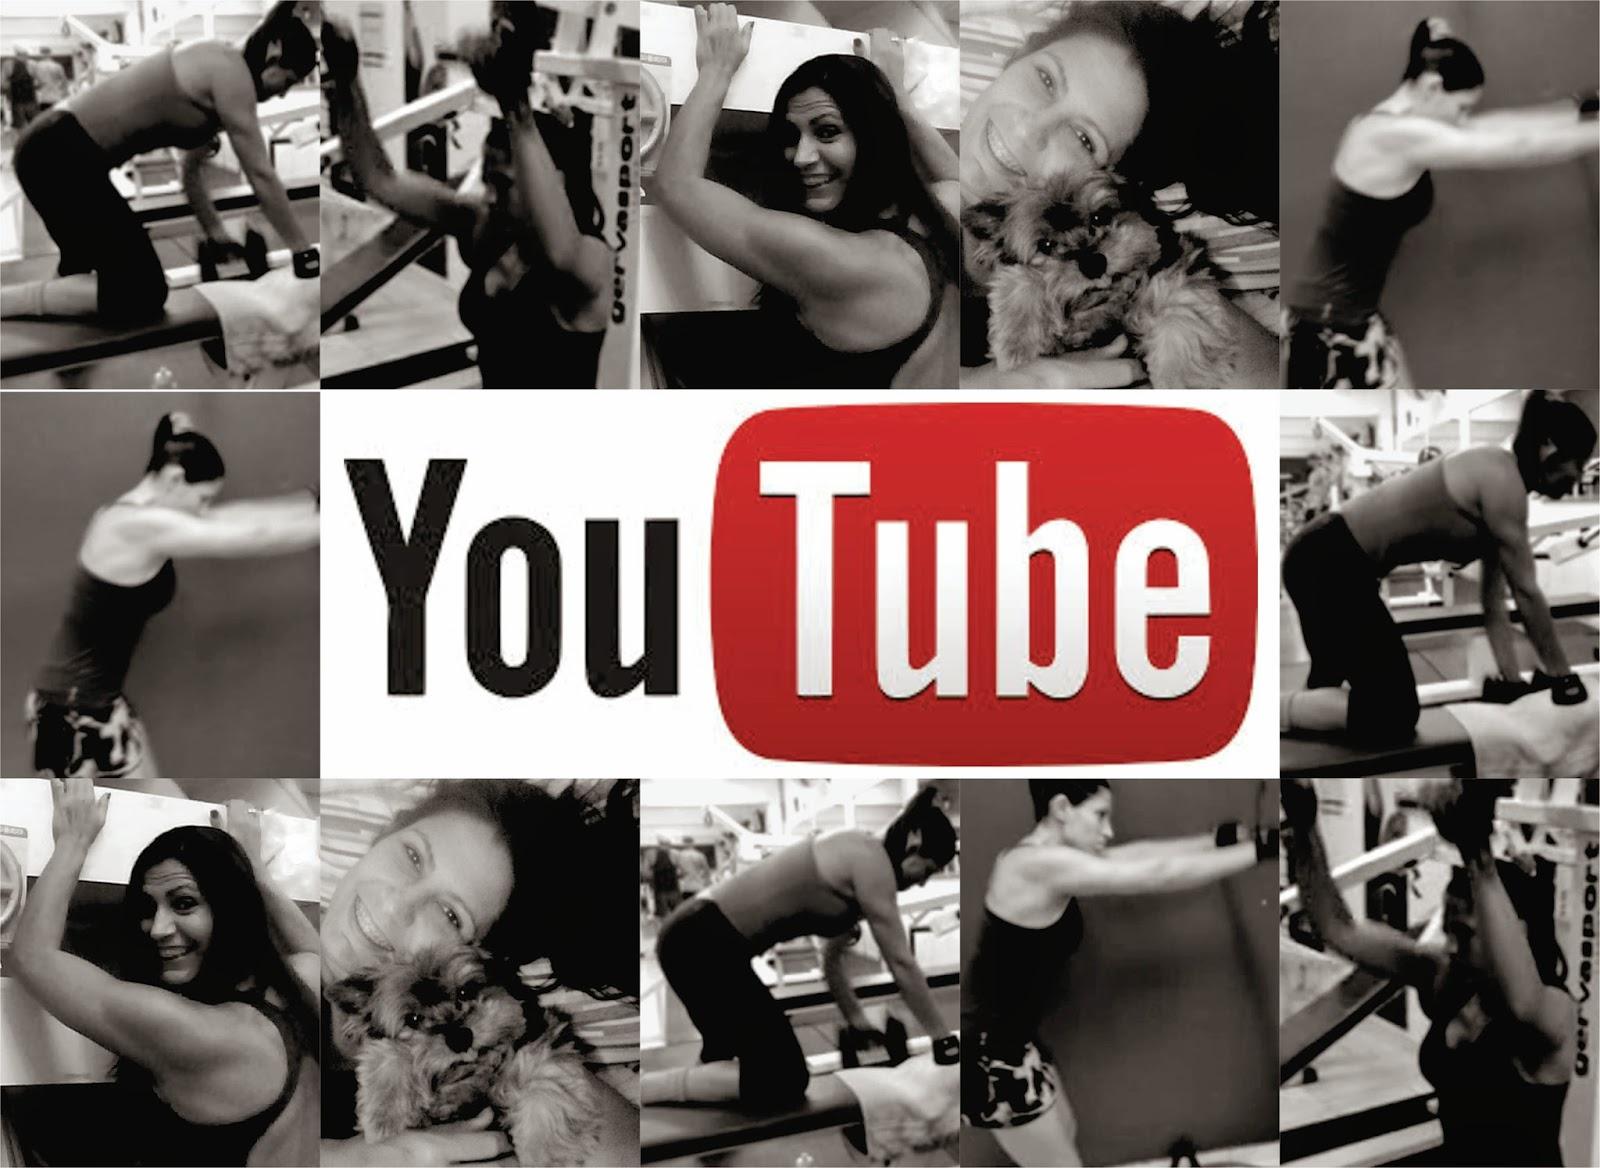 http://www.youtube.com/channel/UCBuqpVAXqf8rwIOQHlHUZVQ